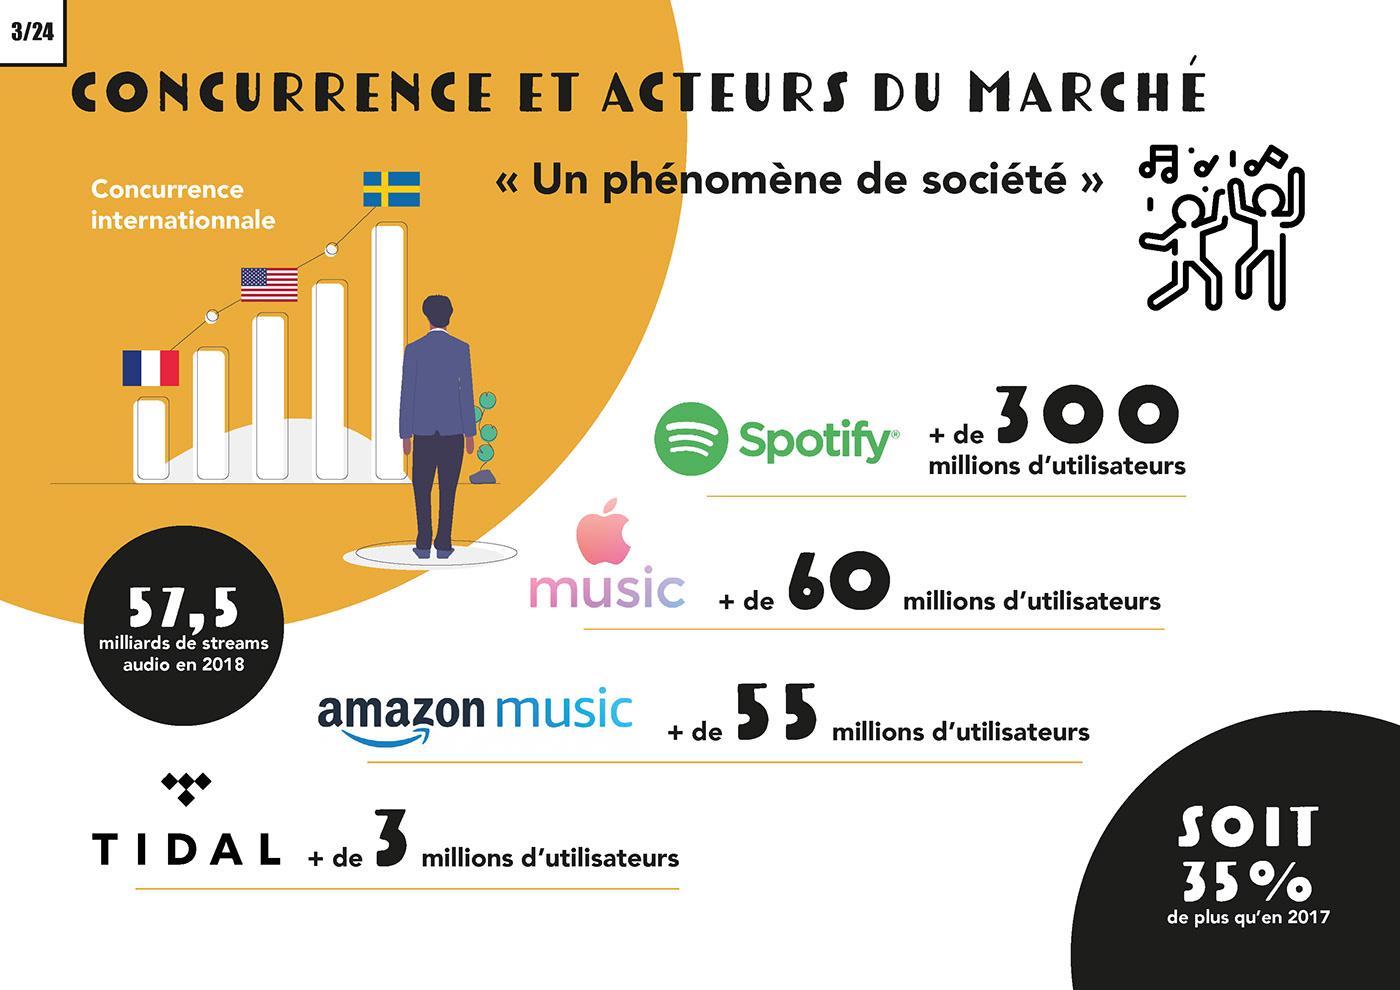 deezer design interactif music social media UI ux